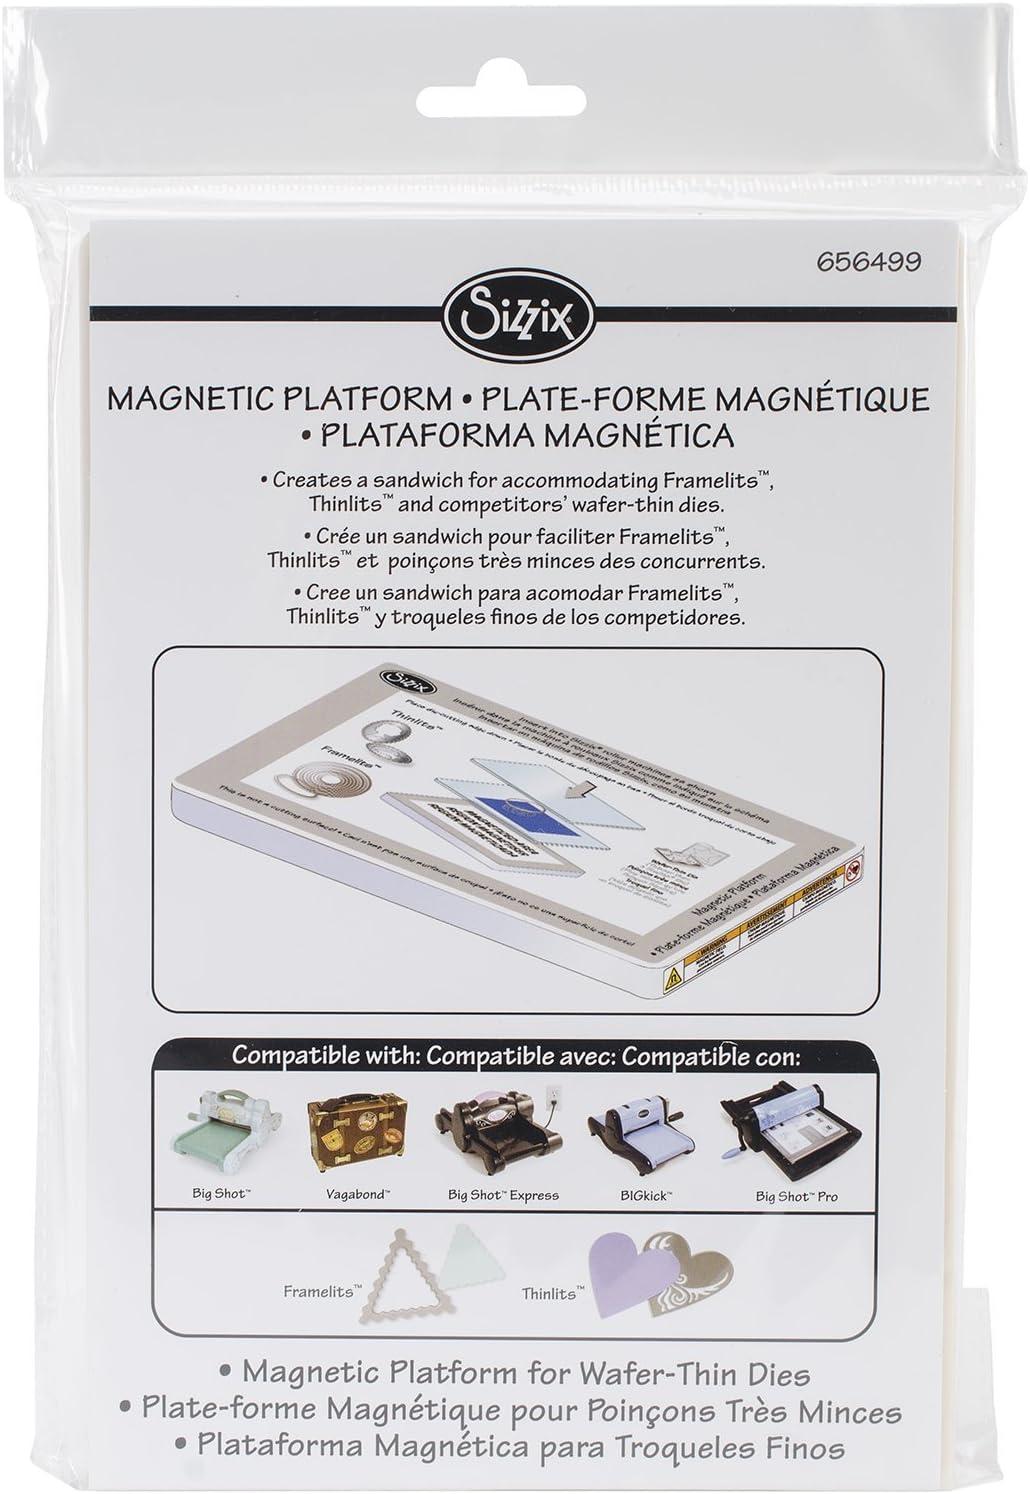 Sizzix 656499  BIGkick//Big Shot//Vagabond Magnetic Platform 6.125 by 8.875 by